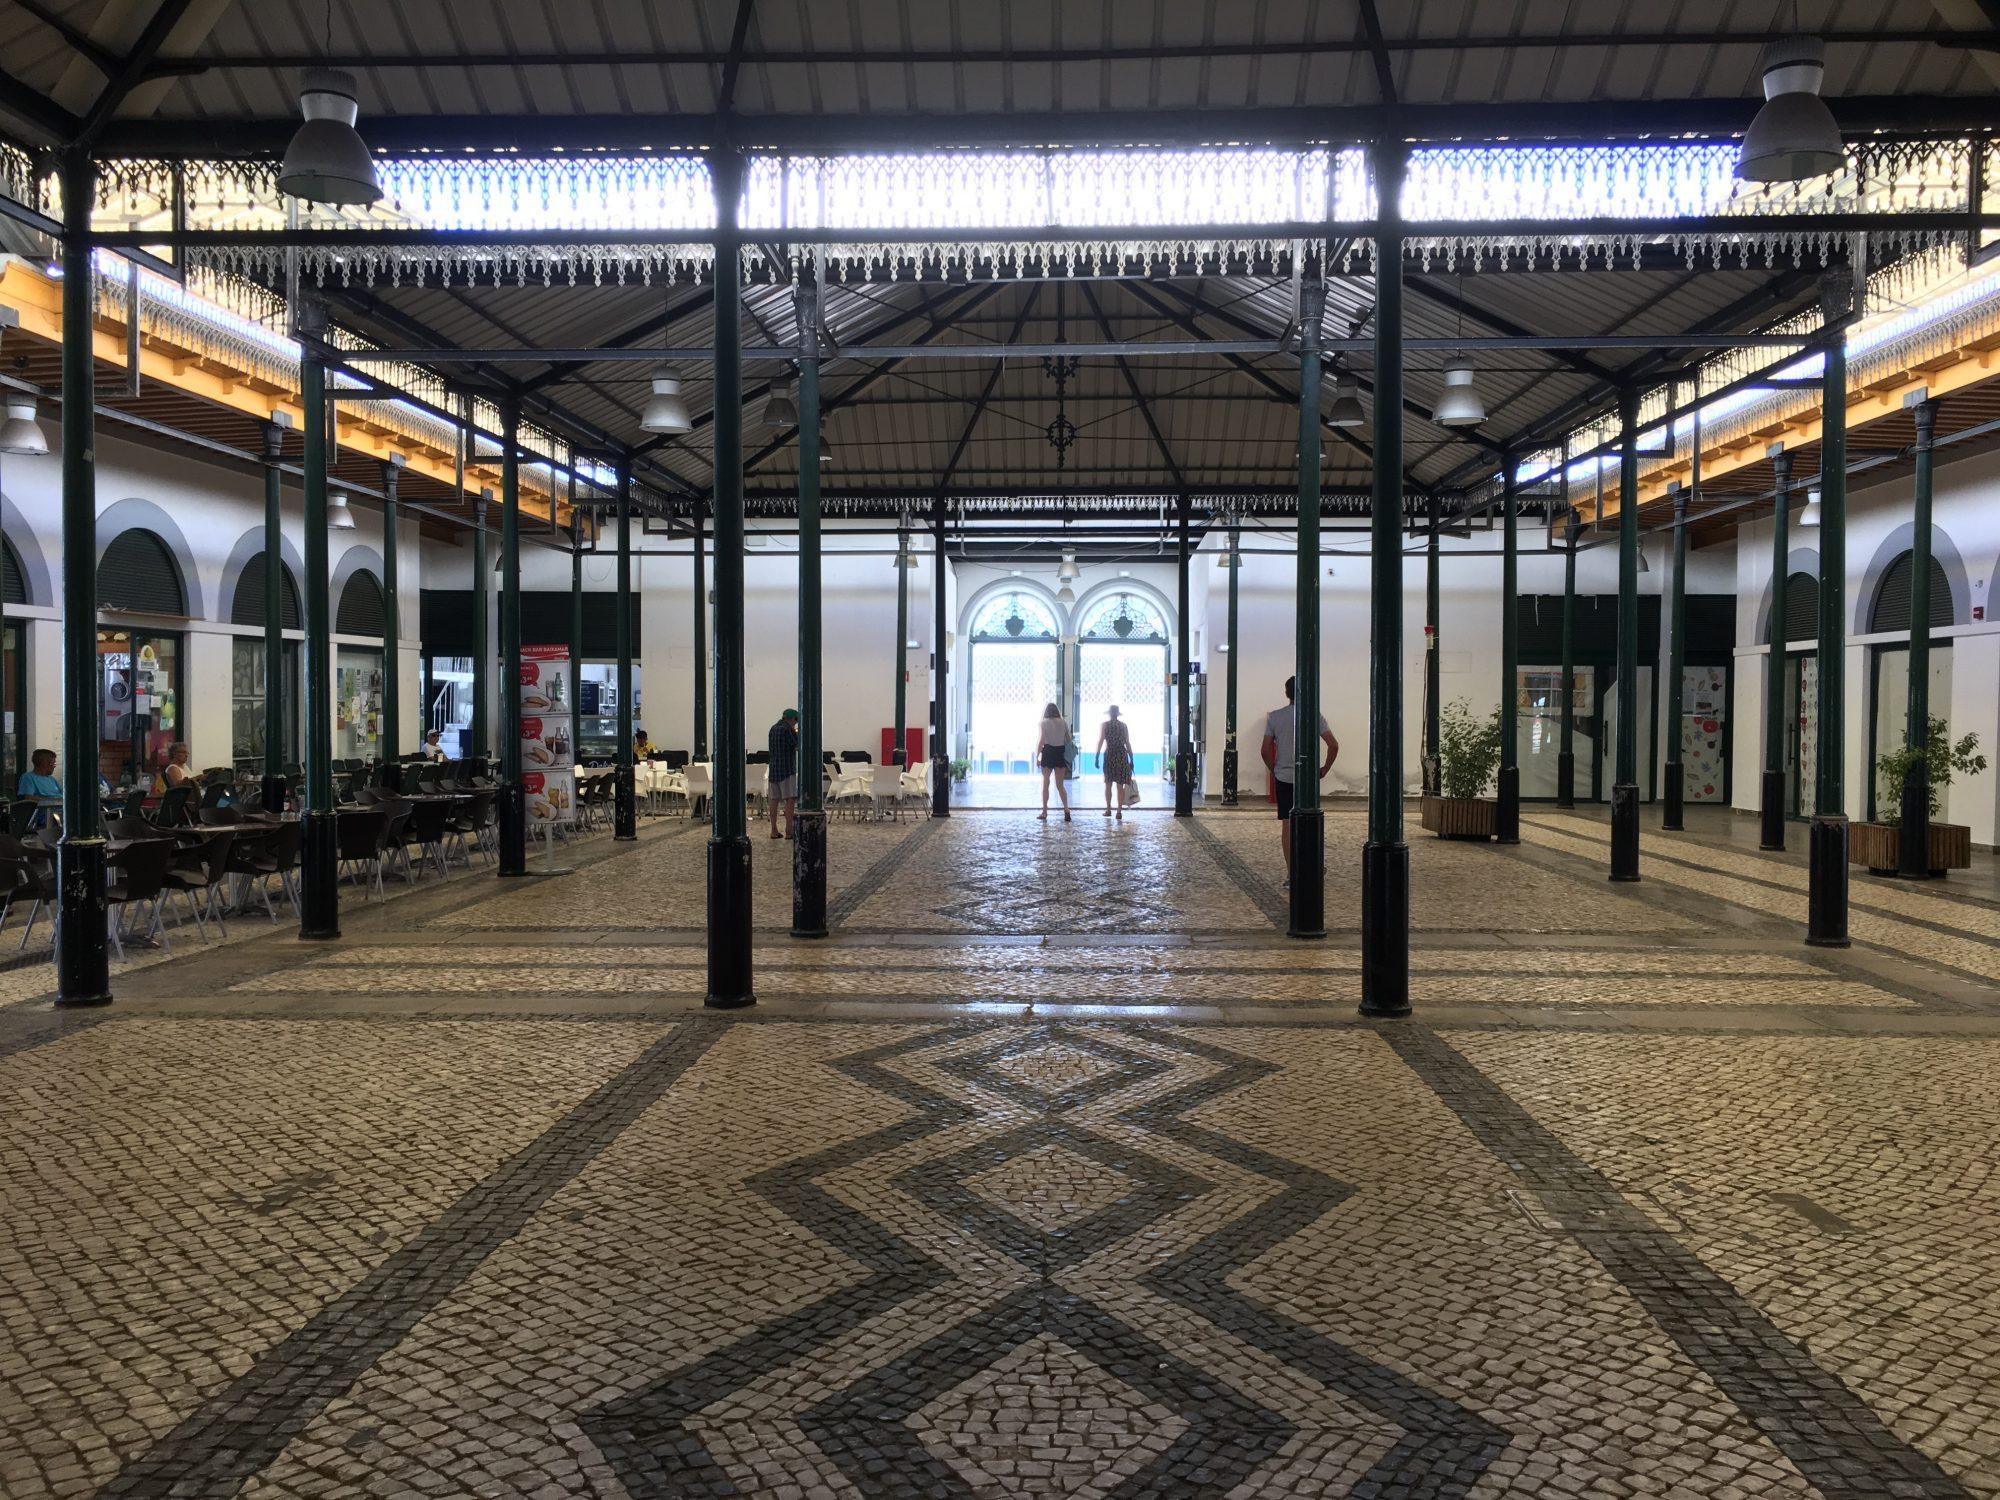 Tavira indoor market